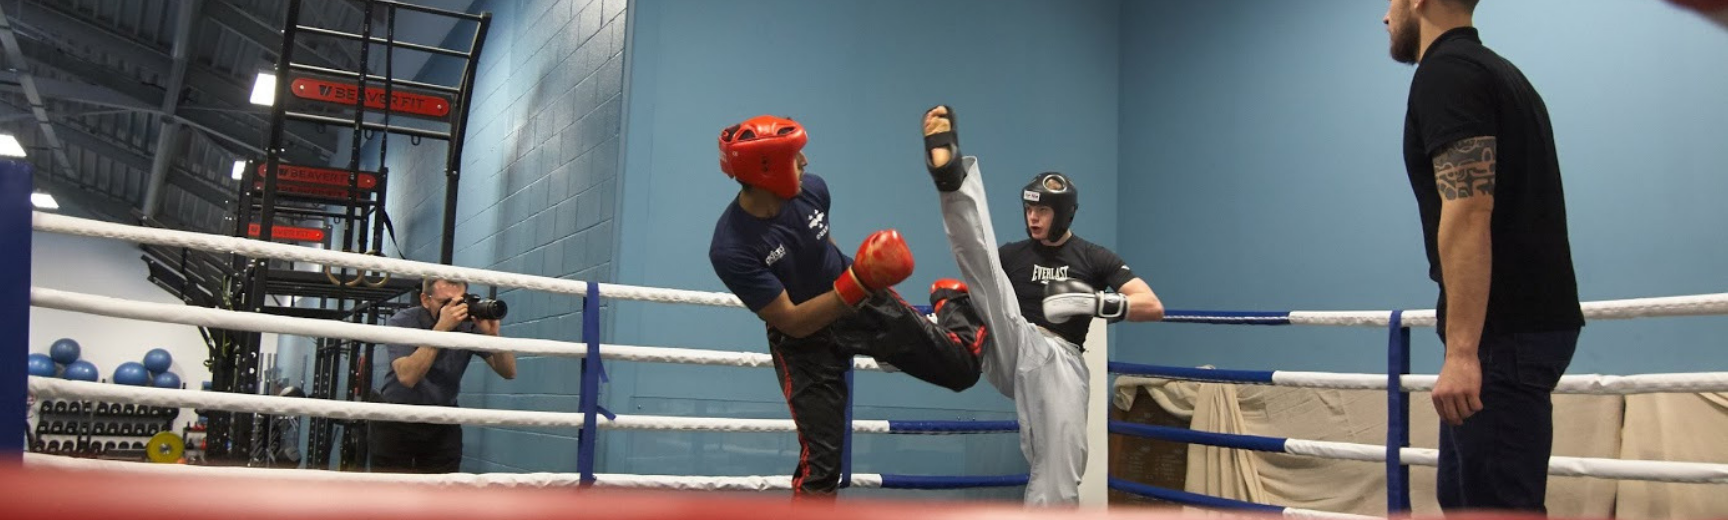 kickboxing banner